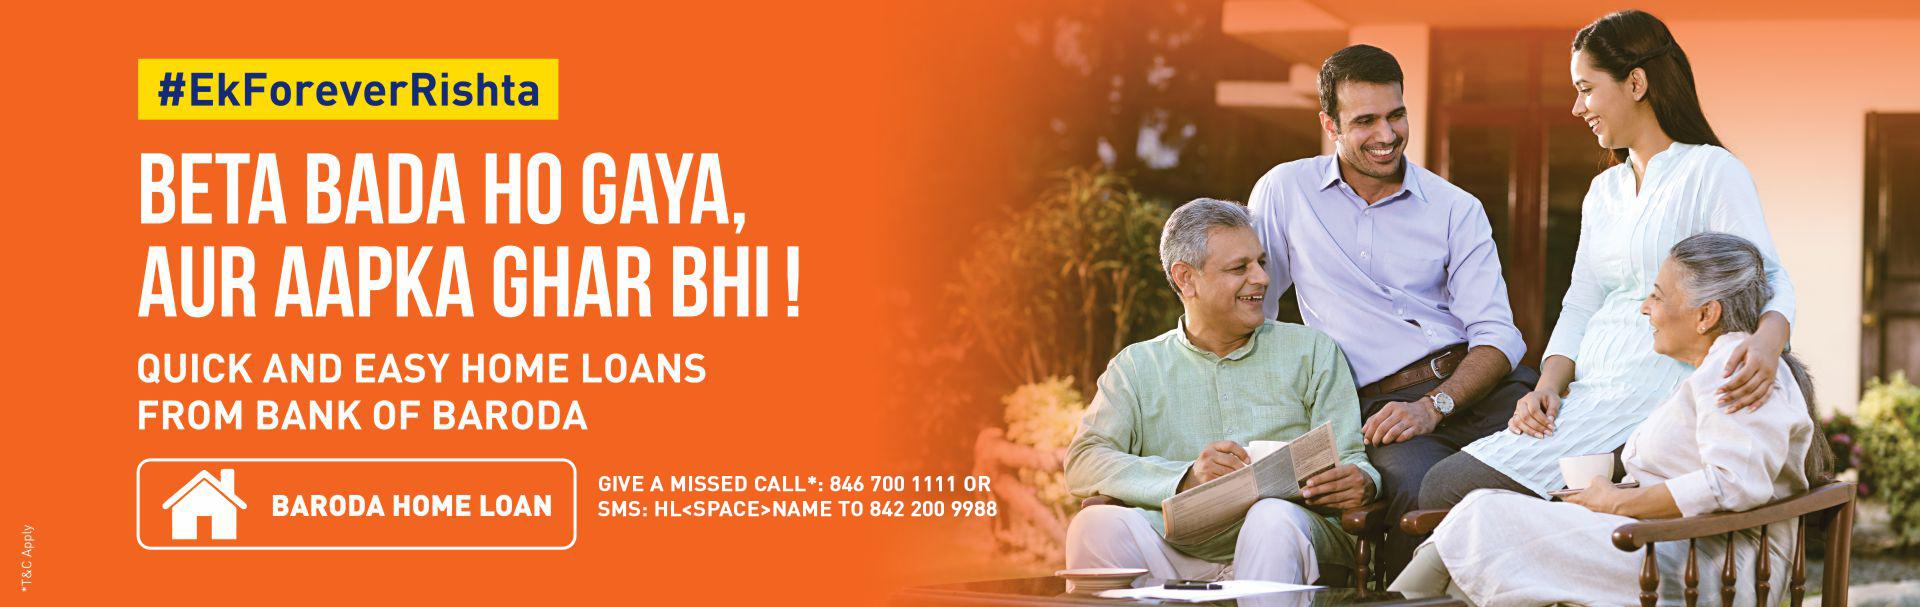 Baroda Home Loan Takeover Scheme